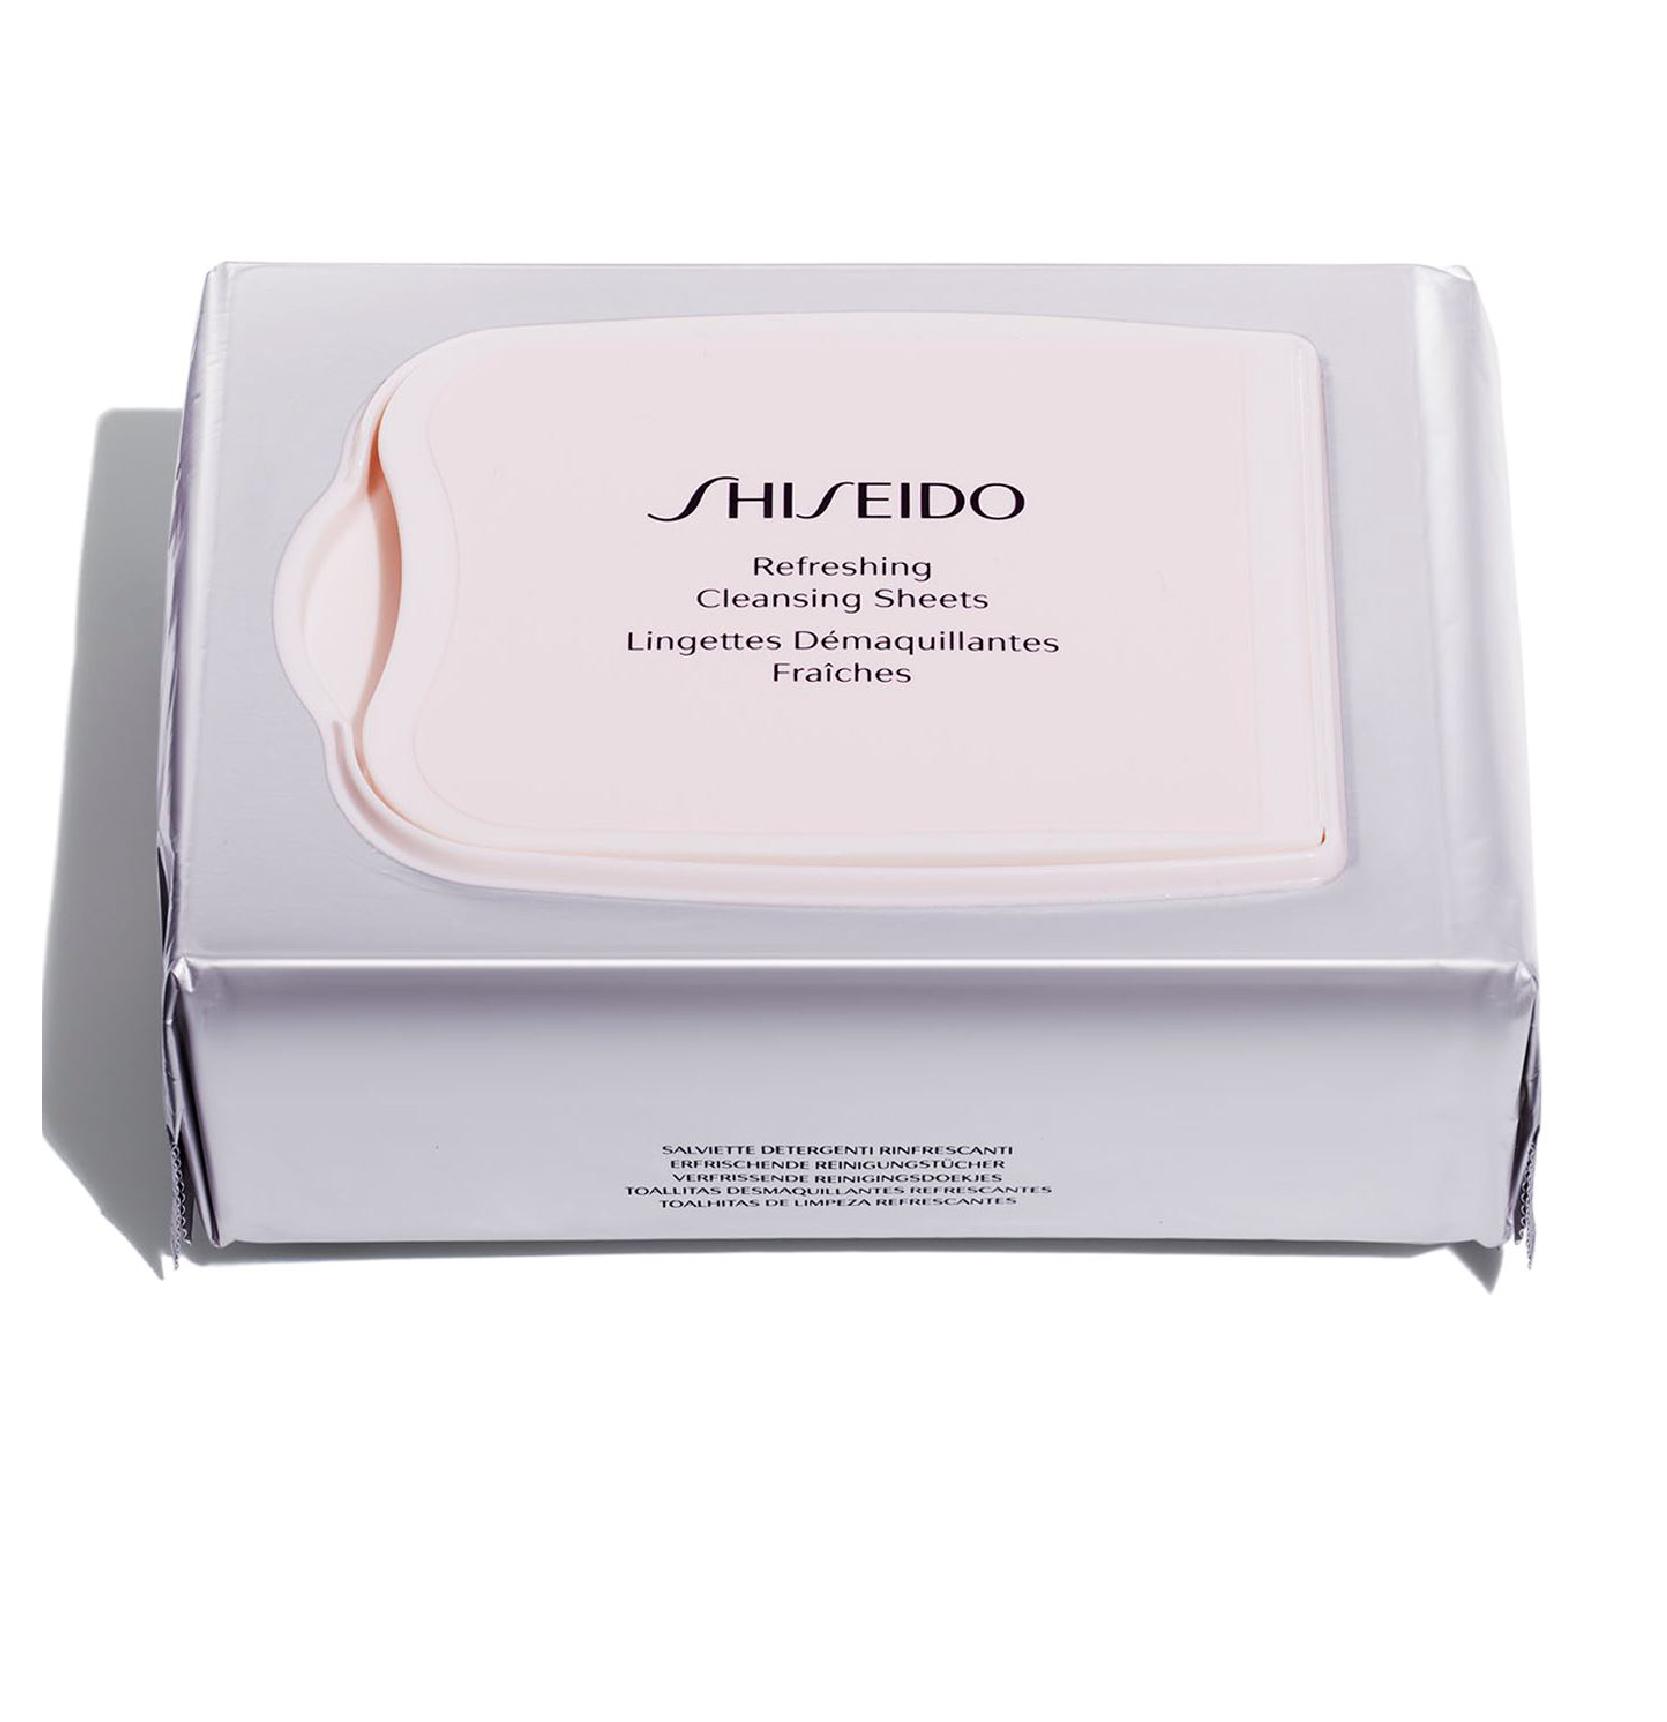 Shiseido - Refreshing Cleansing Sheets